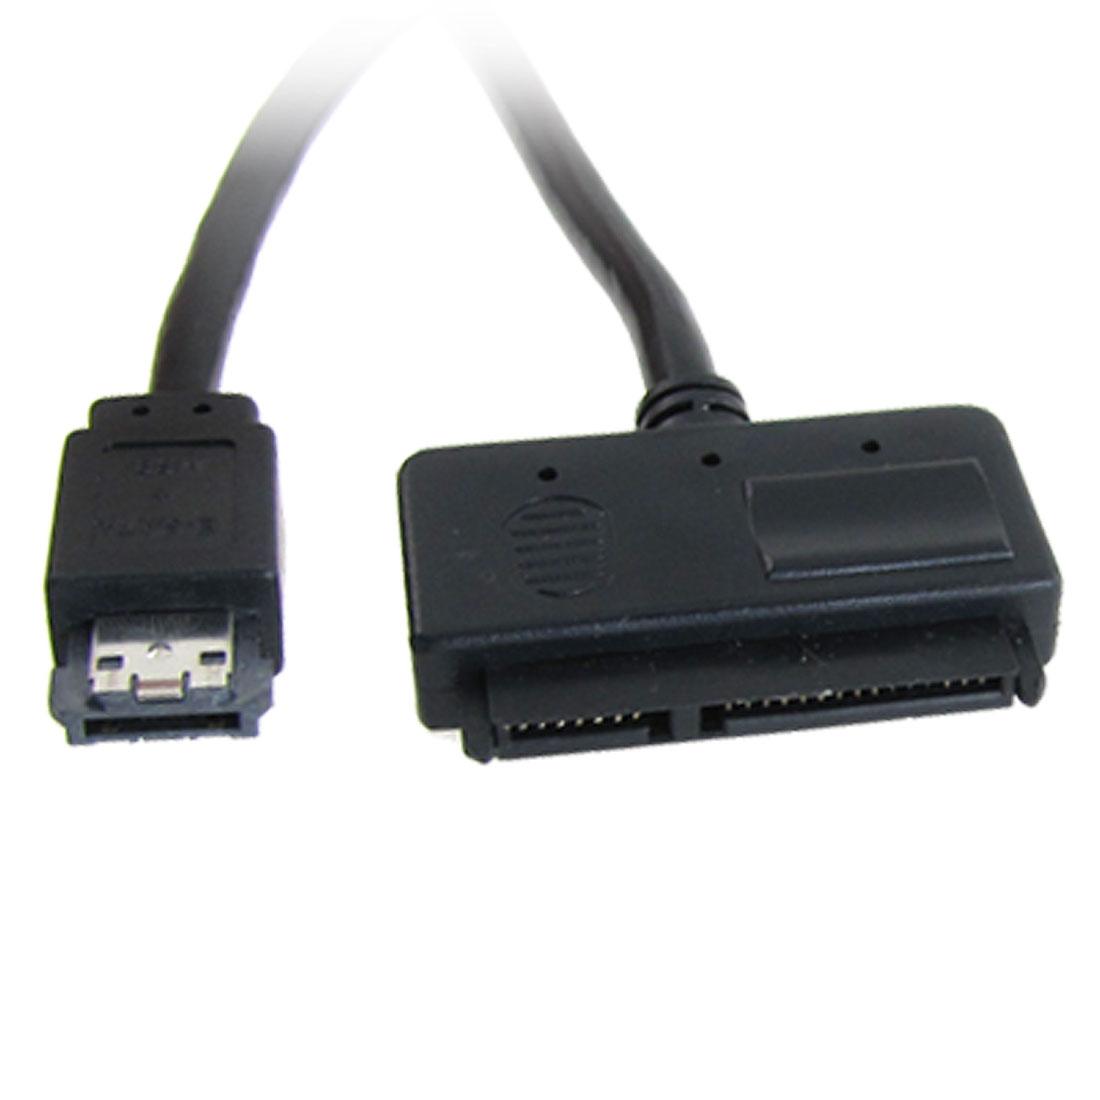 eSATA + USB Combo to Female 7 Pin eSATA Power Cable Black 1M